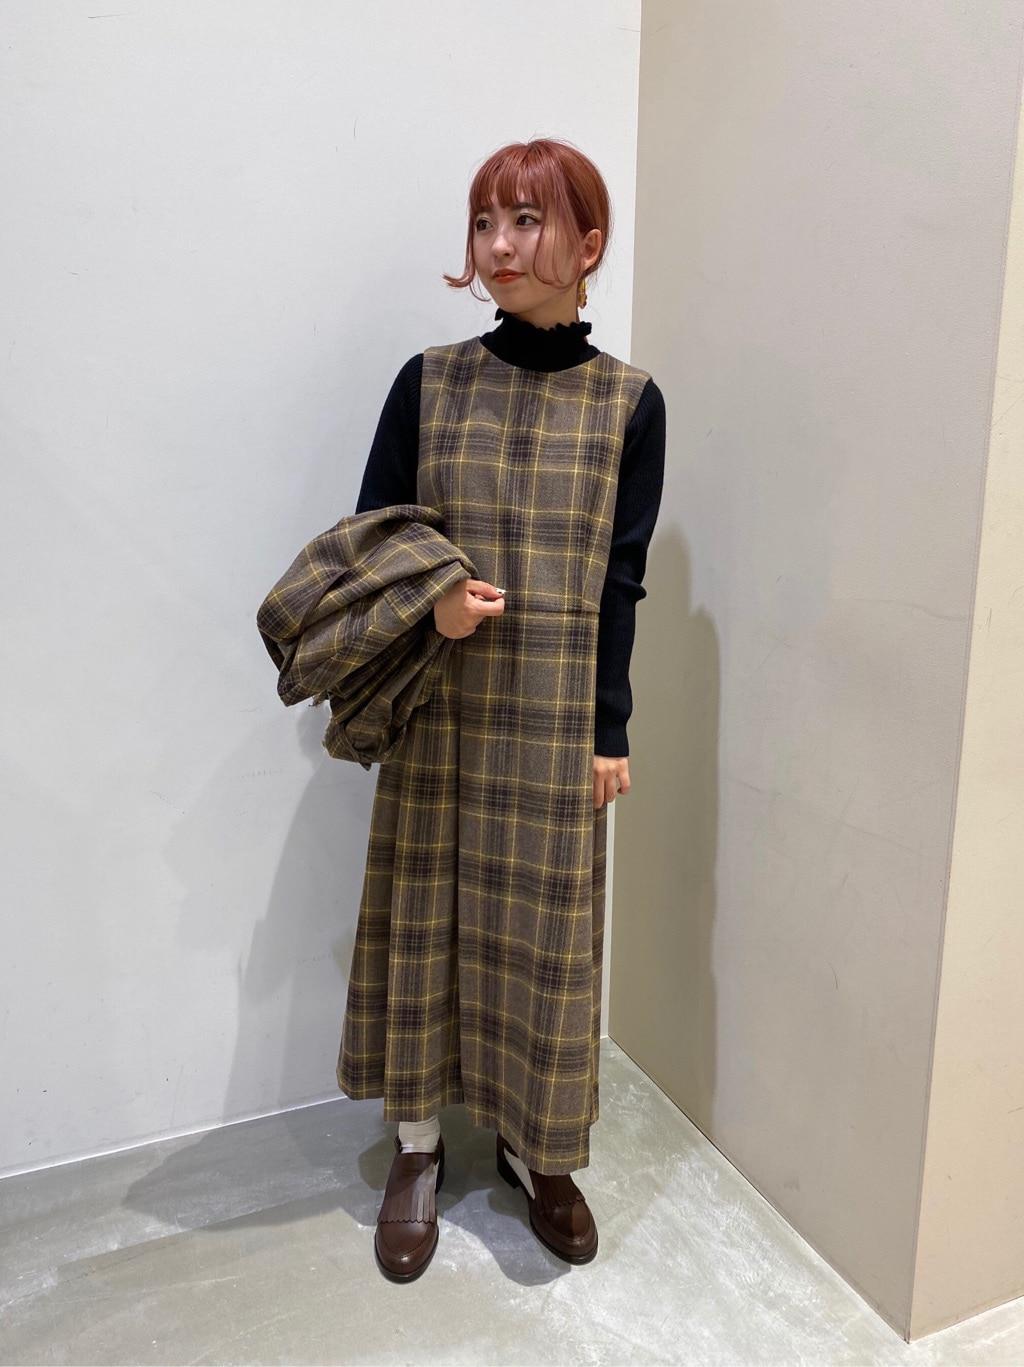 bulle de savon 阪急西宮ガーデンズ 身長:150cm 2020.10.15